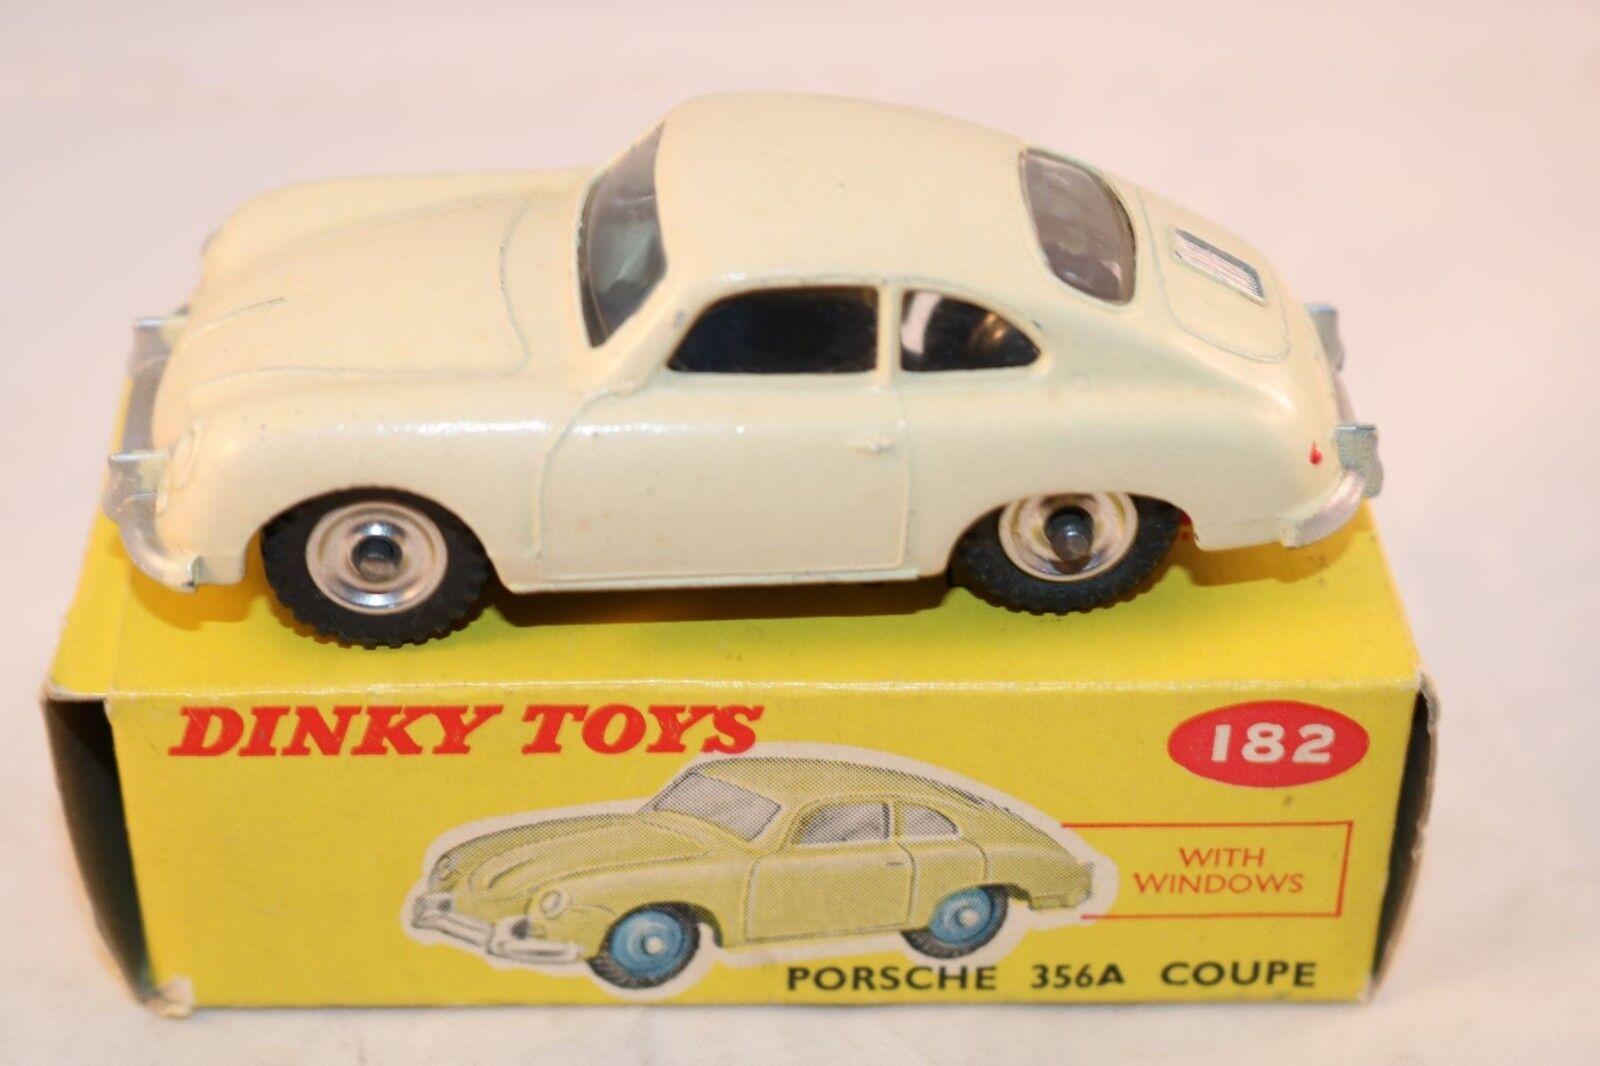 Dinky Toys 182 Porsche 356 cream 99% mint in box original condition SPUN HUBS